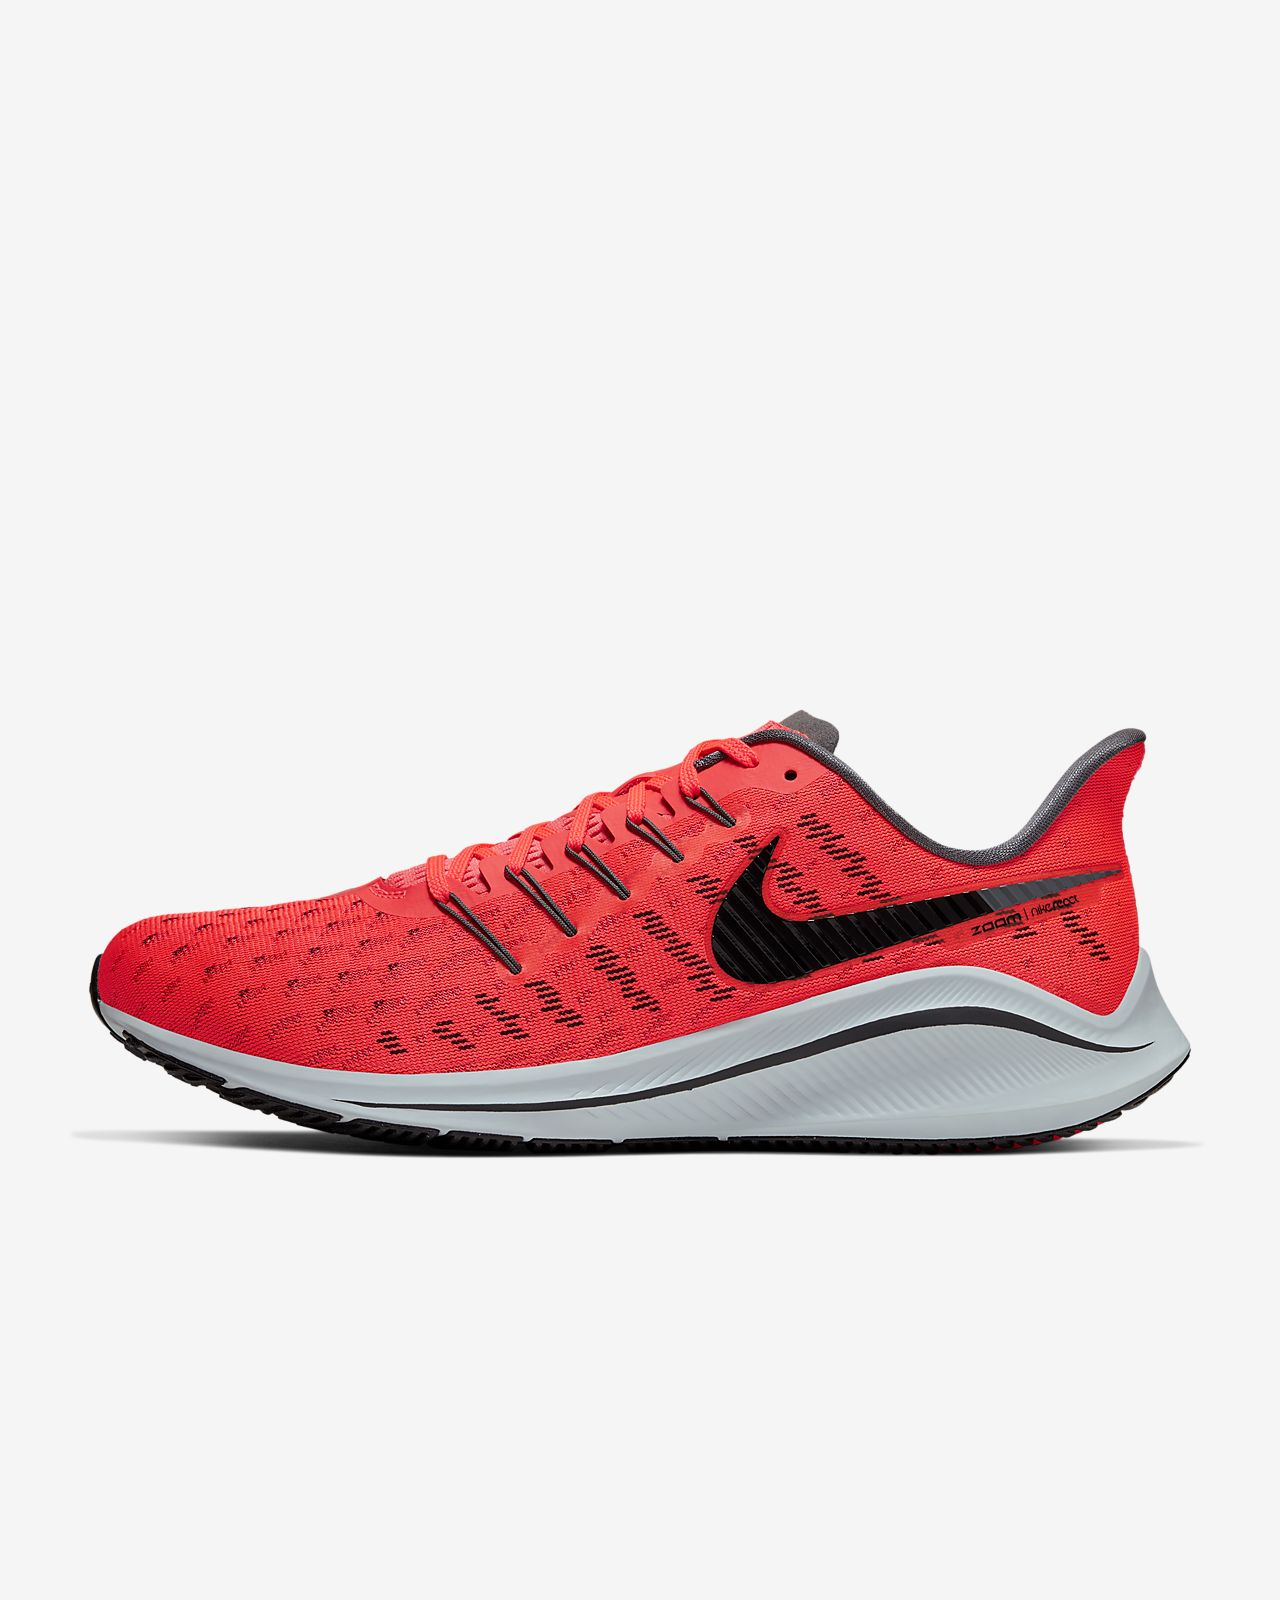 Laufschuh Nike Im Angebot Nike Air Zoom Vomero 11 Damen